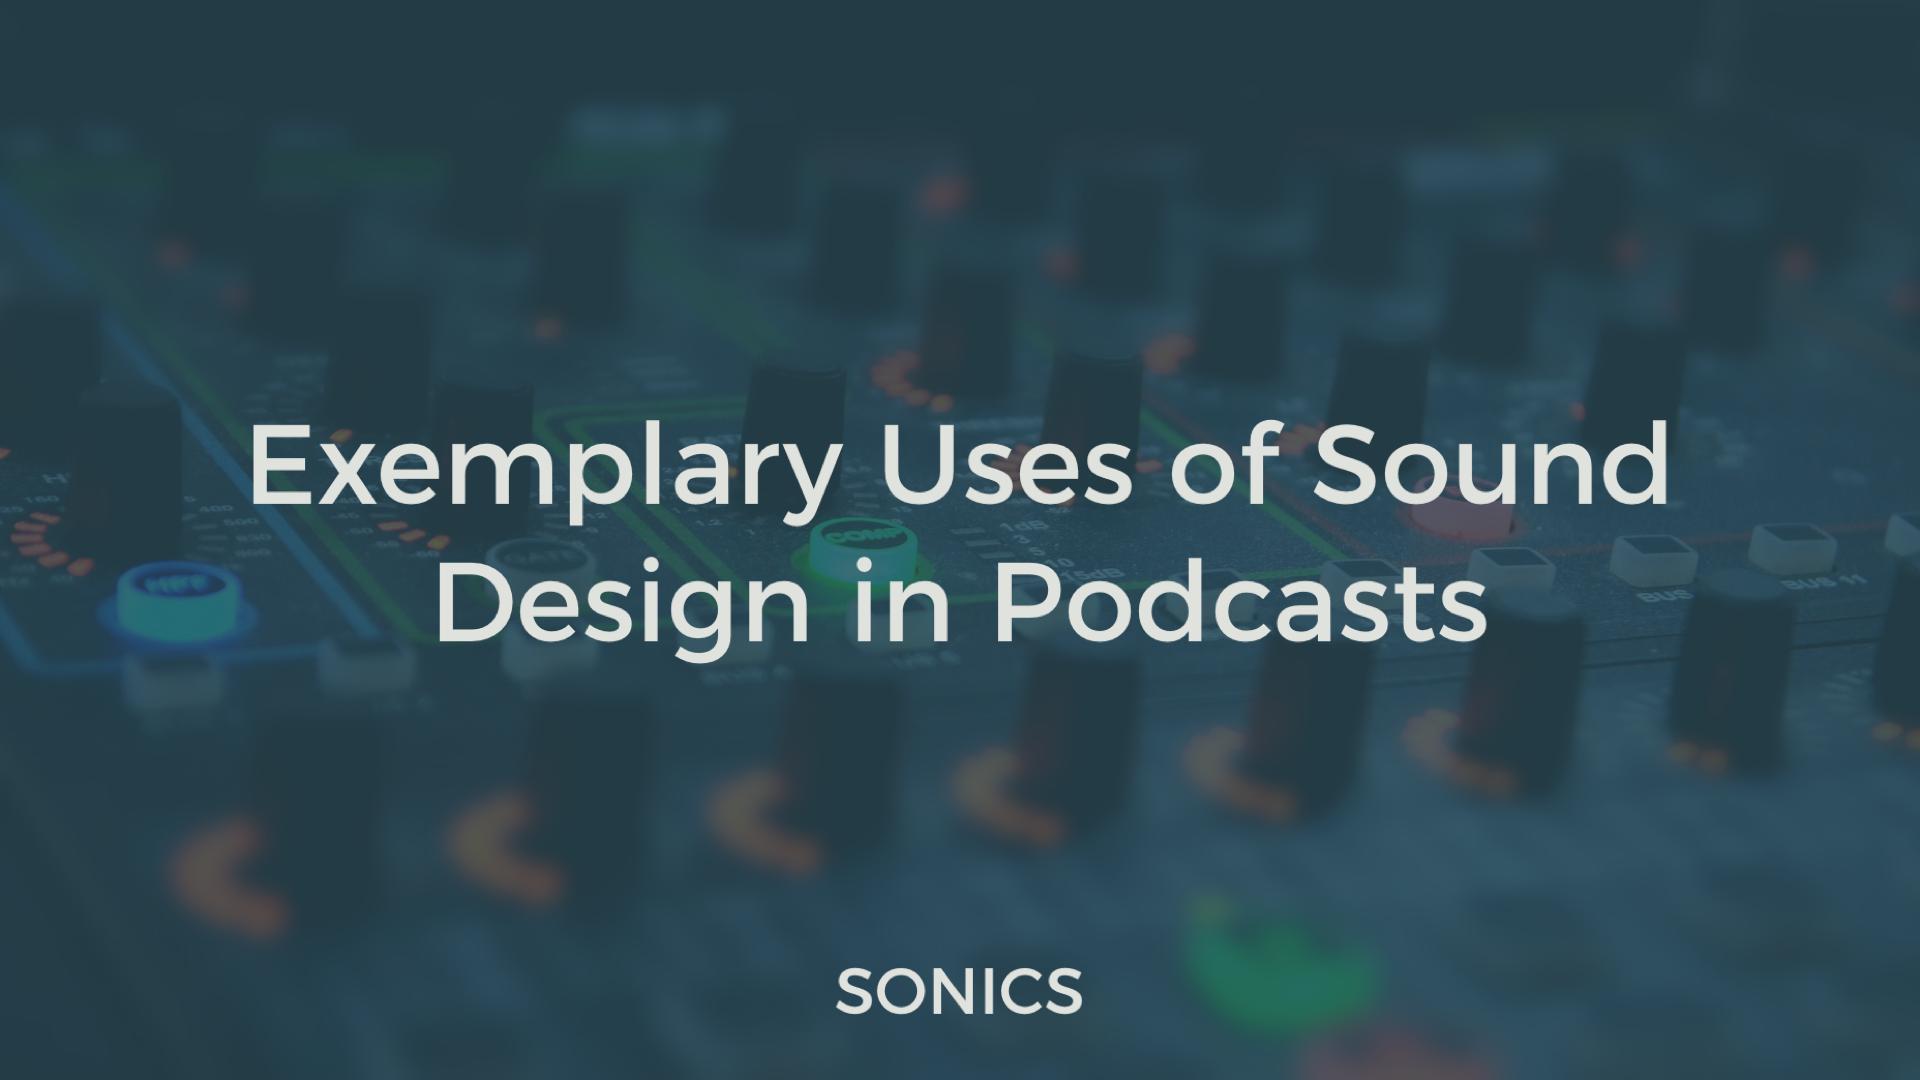 Podcast sound design